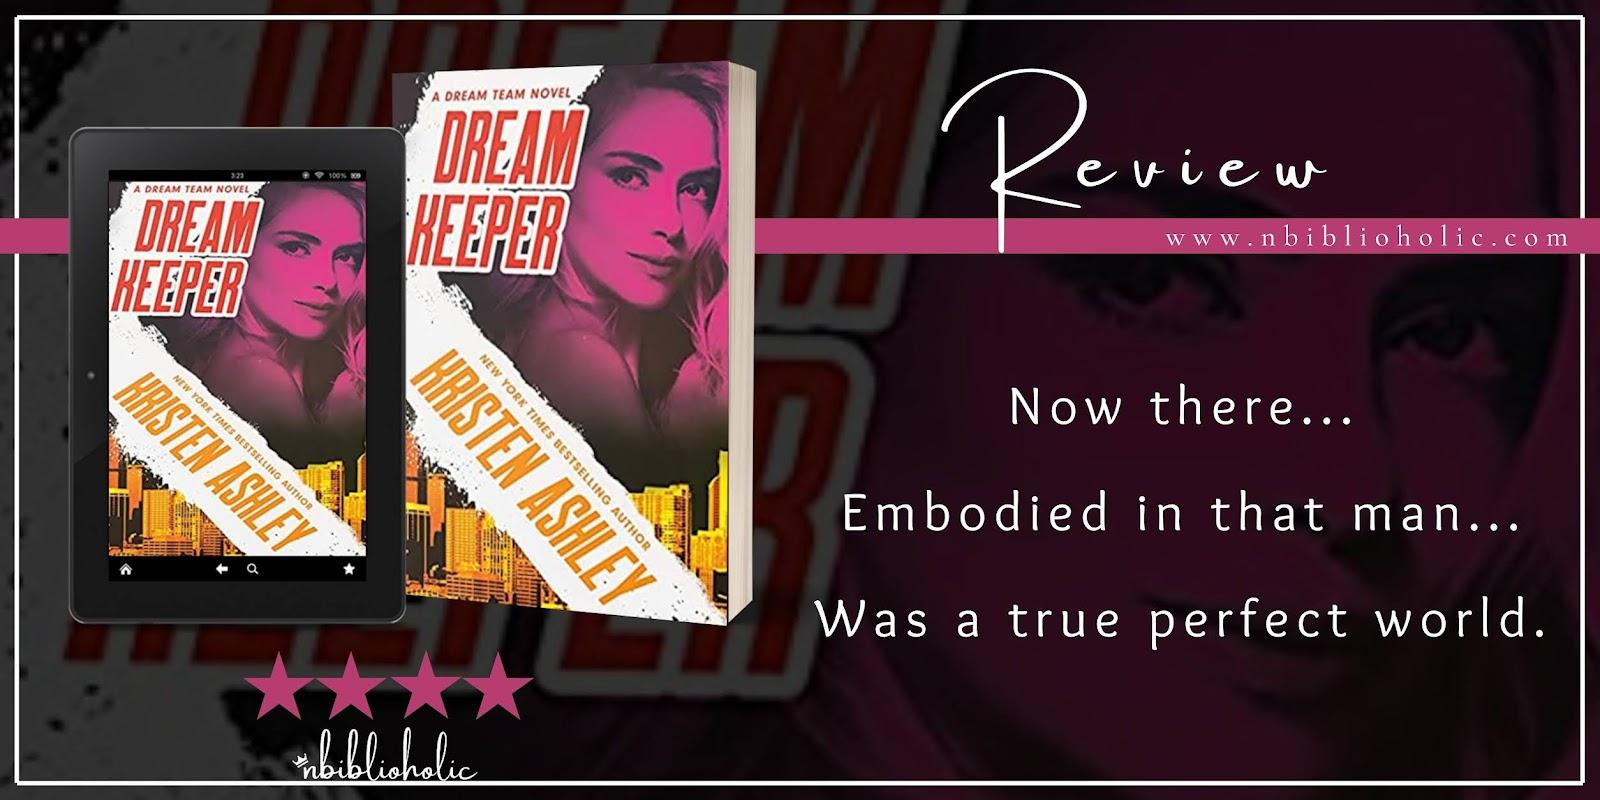 Dream Keeper by Kristen Ashley